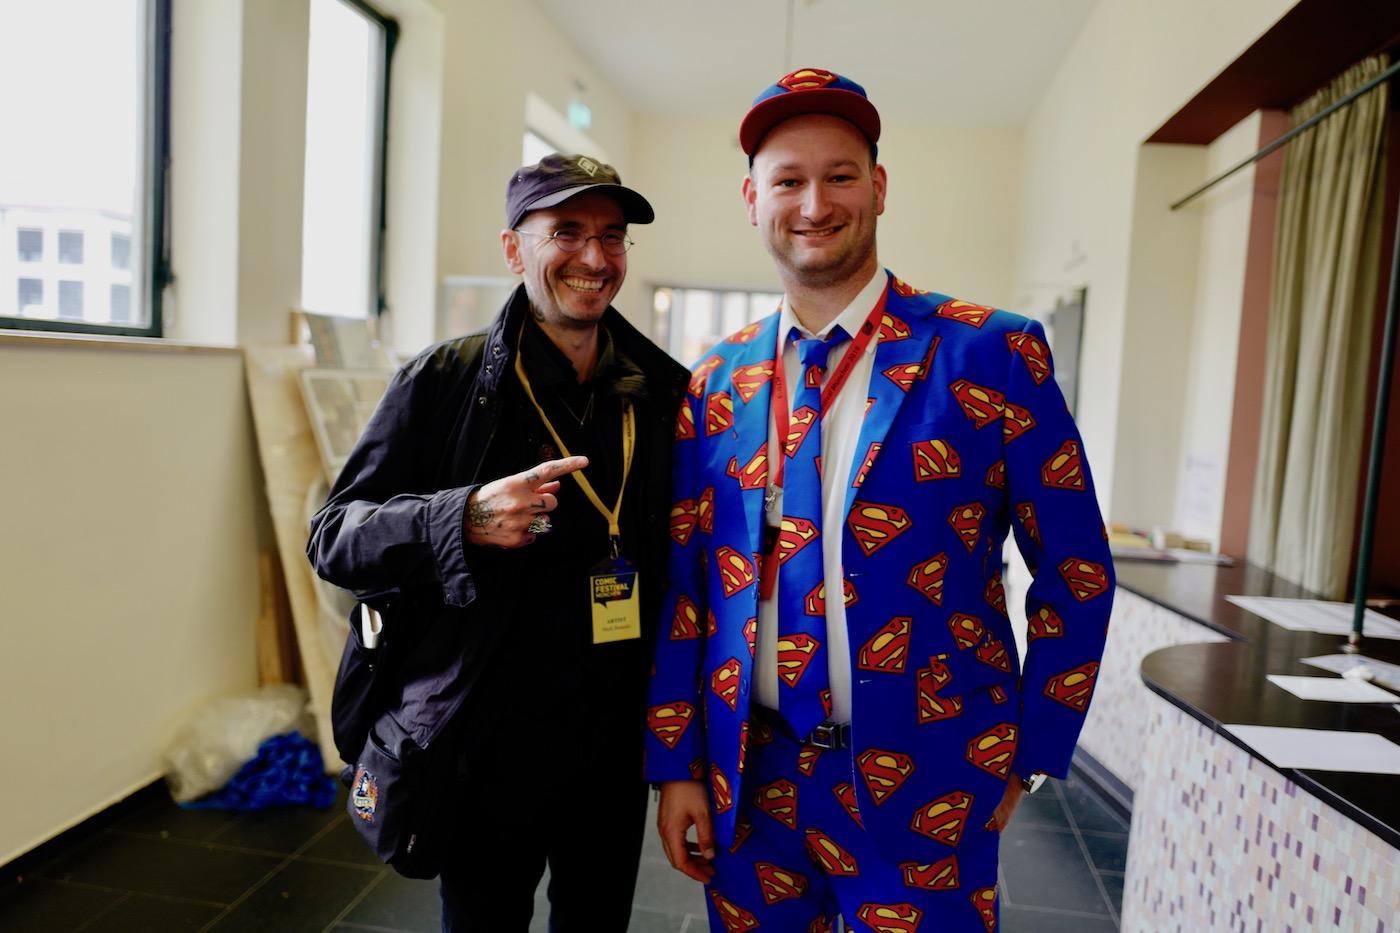 mark_benecke_comic_festival_muenchen_munich_comic_con_2019 - 4.jpg